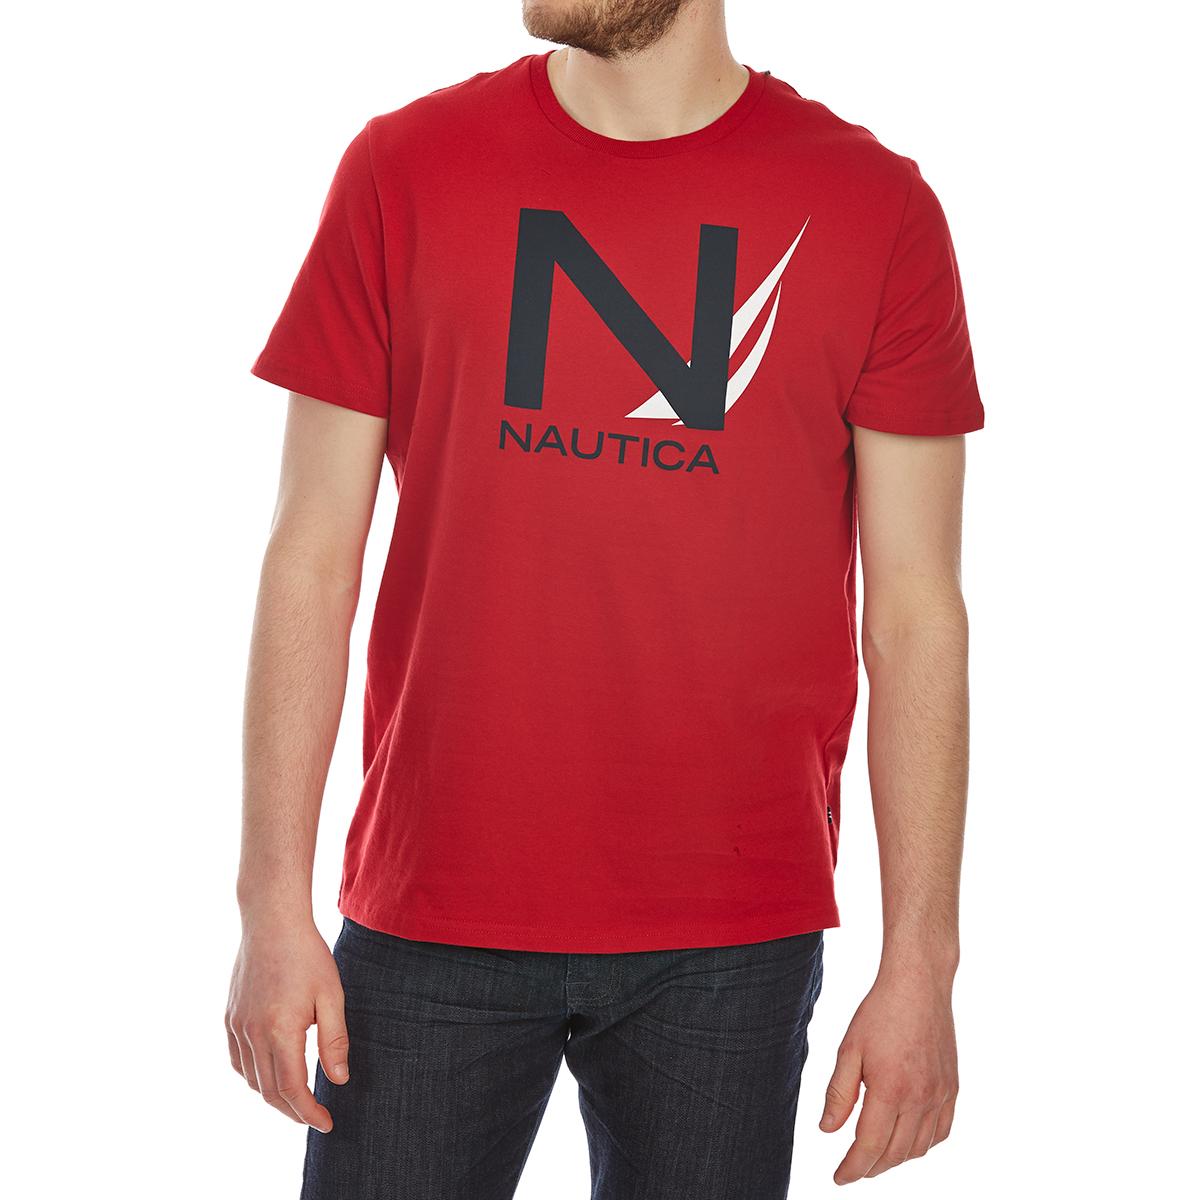 Nautica Men's Heritage Graphic Short-Sleeve Tee - Red, L